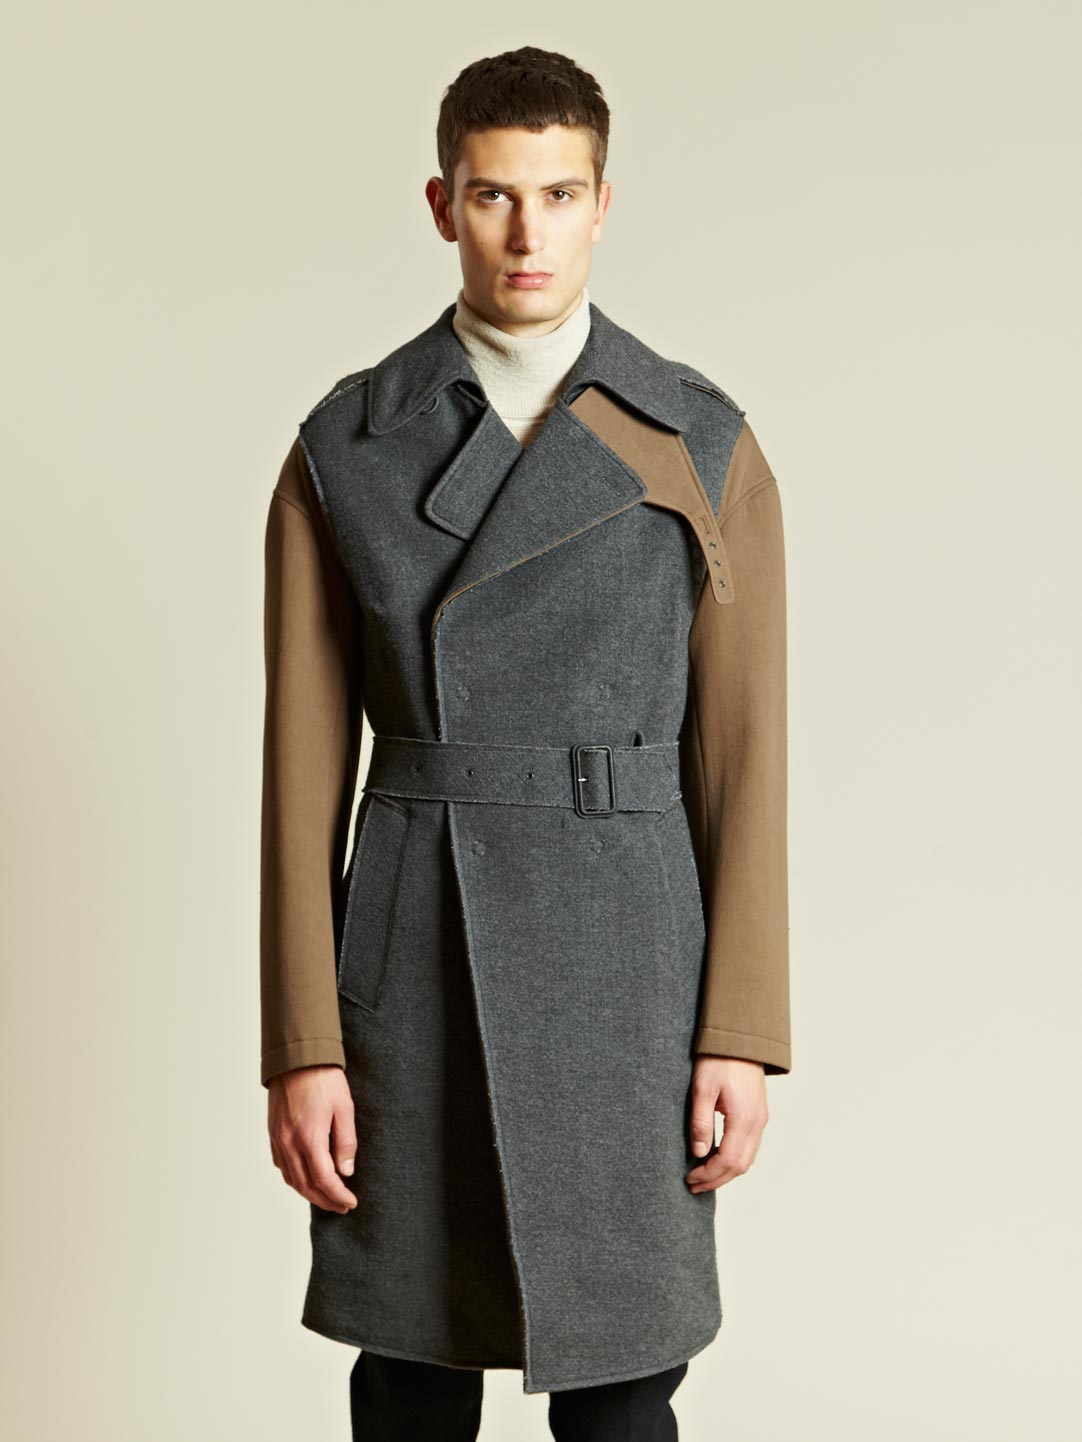 Lyst Lanvin Lanvin Mens Contrast Manteau Coat In Natural